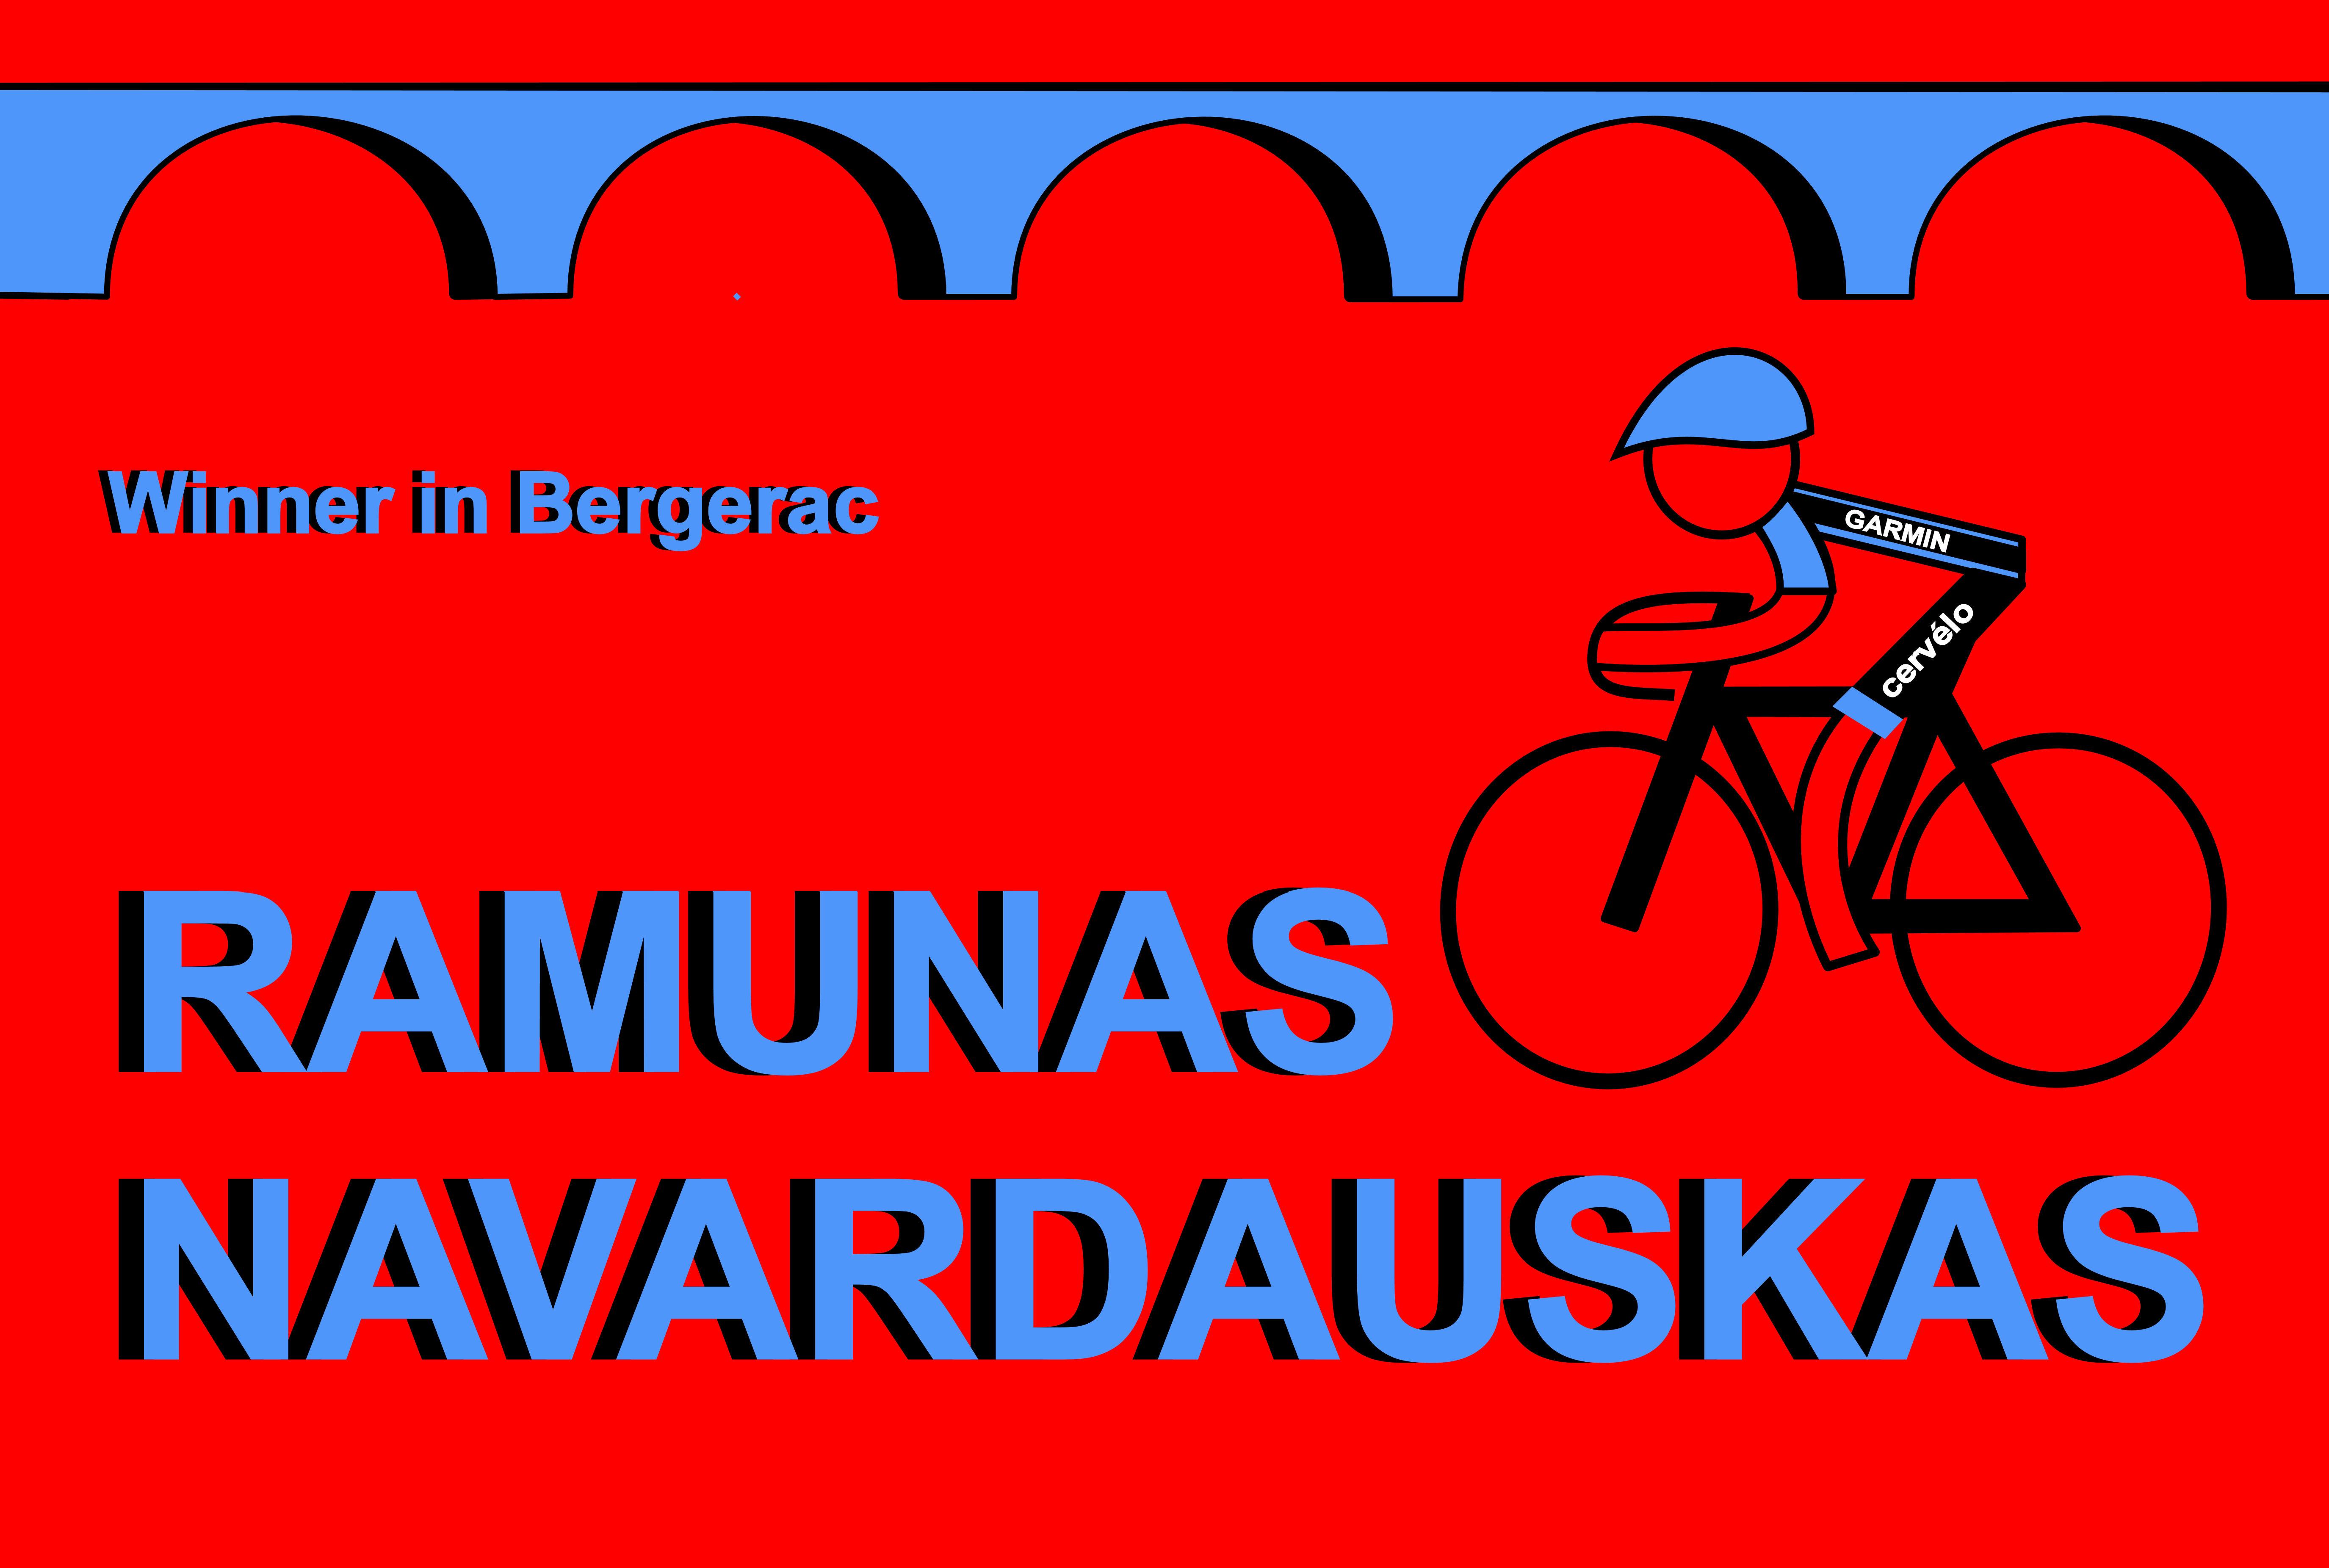 Maubourguet                                                     Pays du Val d'Adour,                                                     Bergerac, Bergerac                                                     Bridge, RAMUNAS                                                     NAVARDAUSKAS, stage                                                     19, July 25th, Tour                                                     de France 2014, Tour                                                     de France,                                                     Maubourguet Pays du                                                     Val d'Adour,                                                     Bergerac, Bergerac                                                     Bridge, Ramunas                                                     Navardauskas, étape                                                     19, le 25 Juillet,                                                     Tour de France 2014,                                                     Tour de France